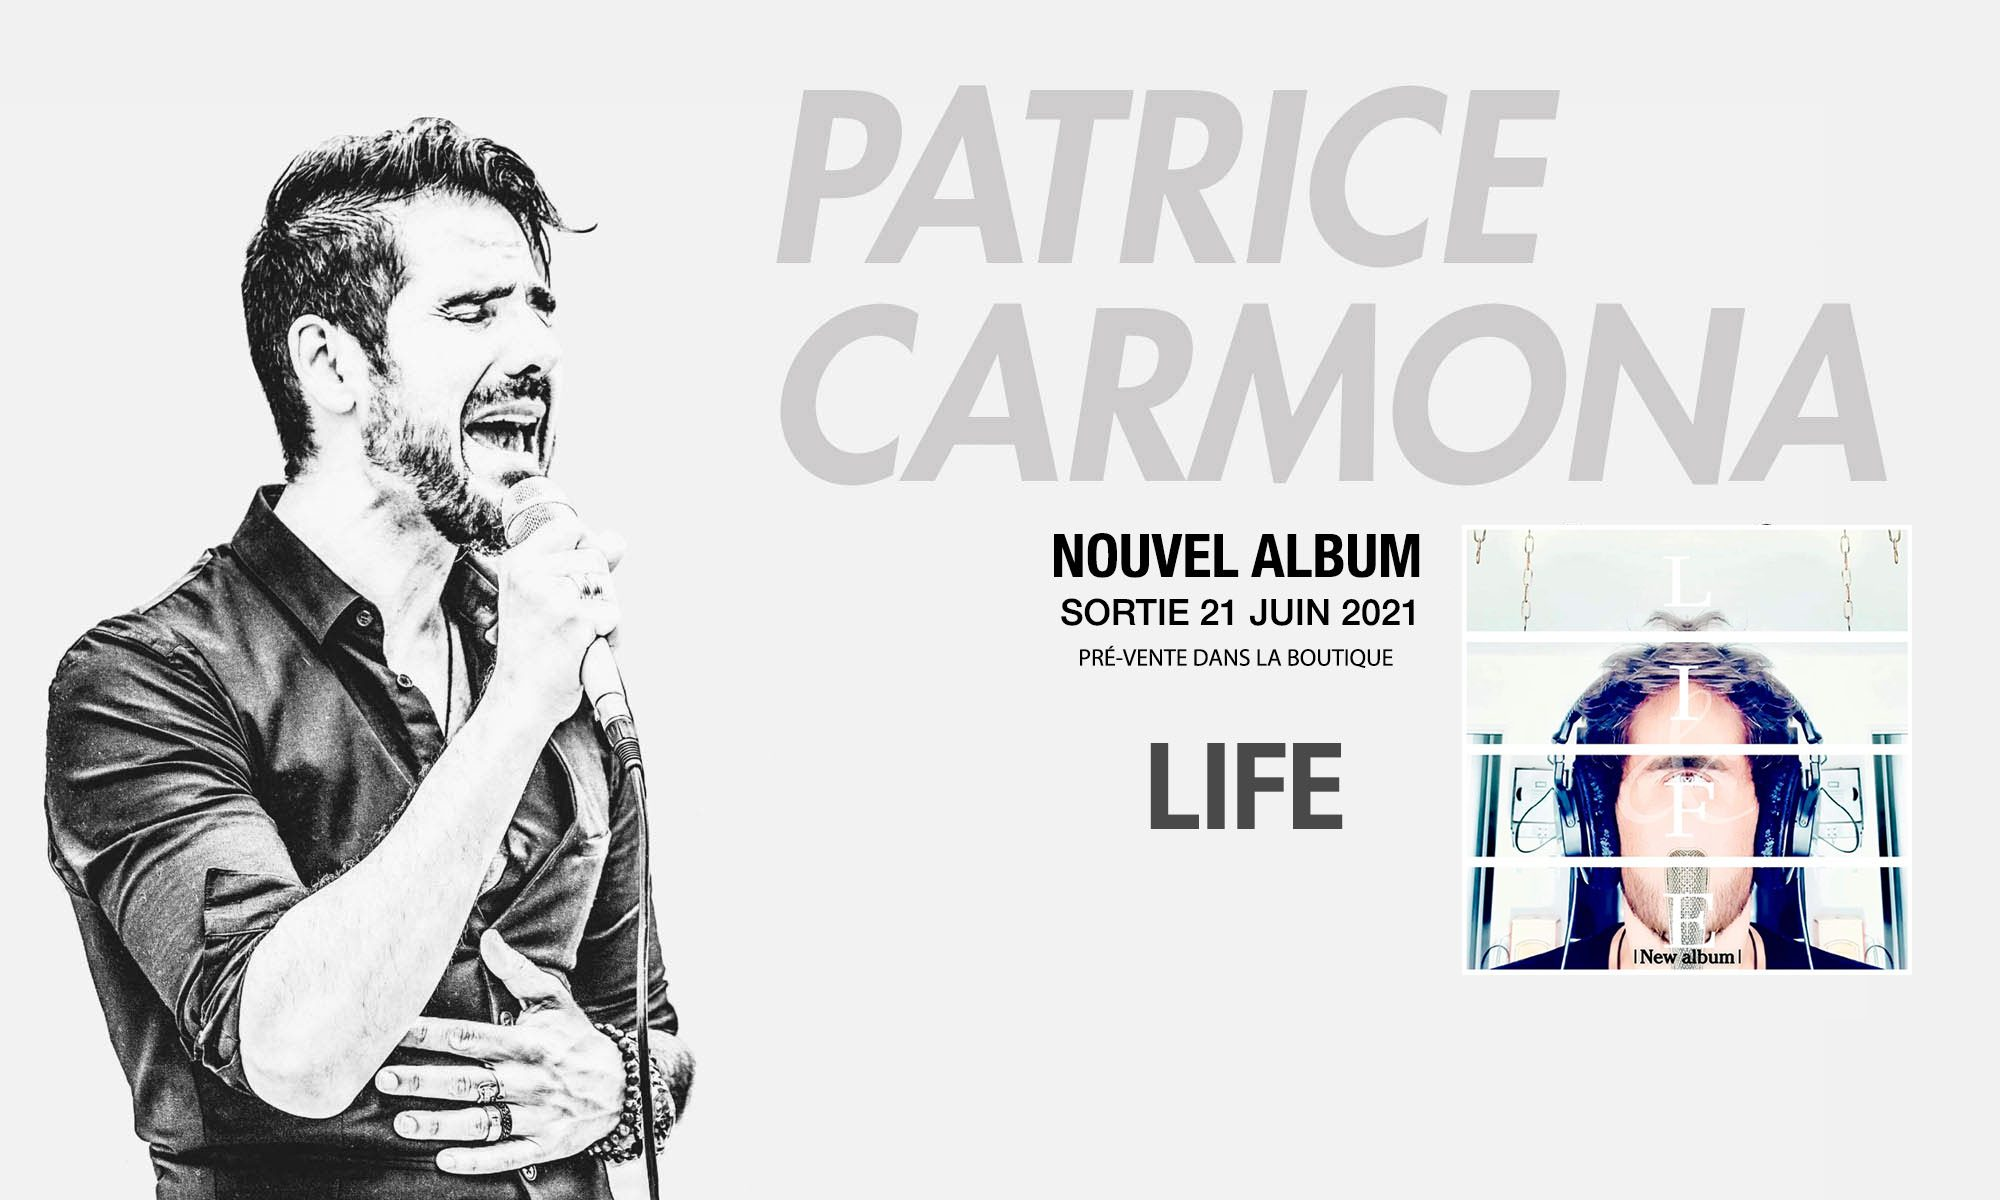 Patrice Carmona